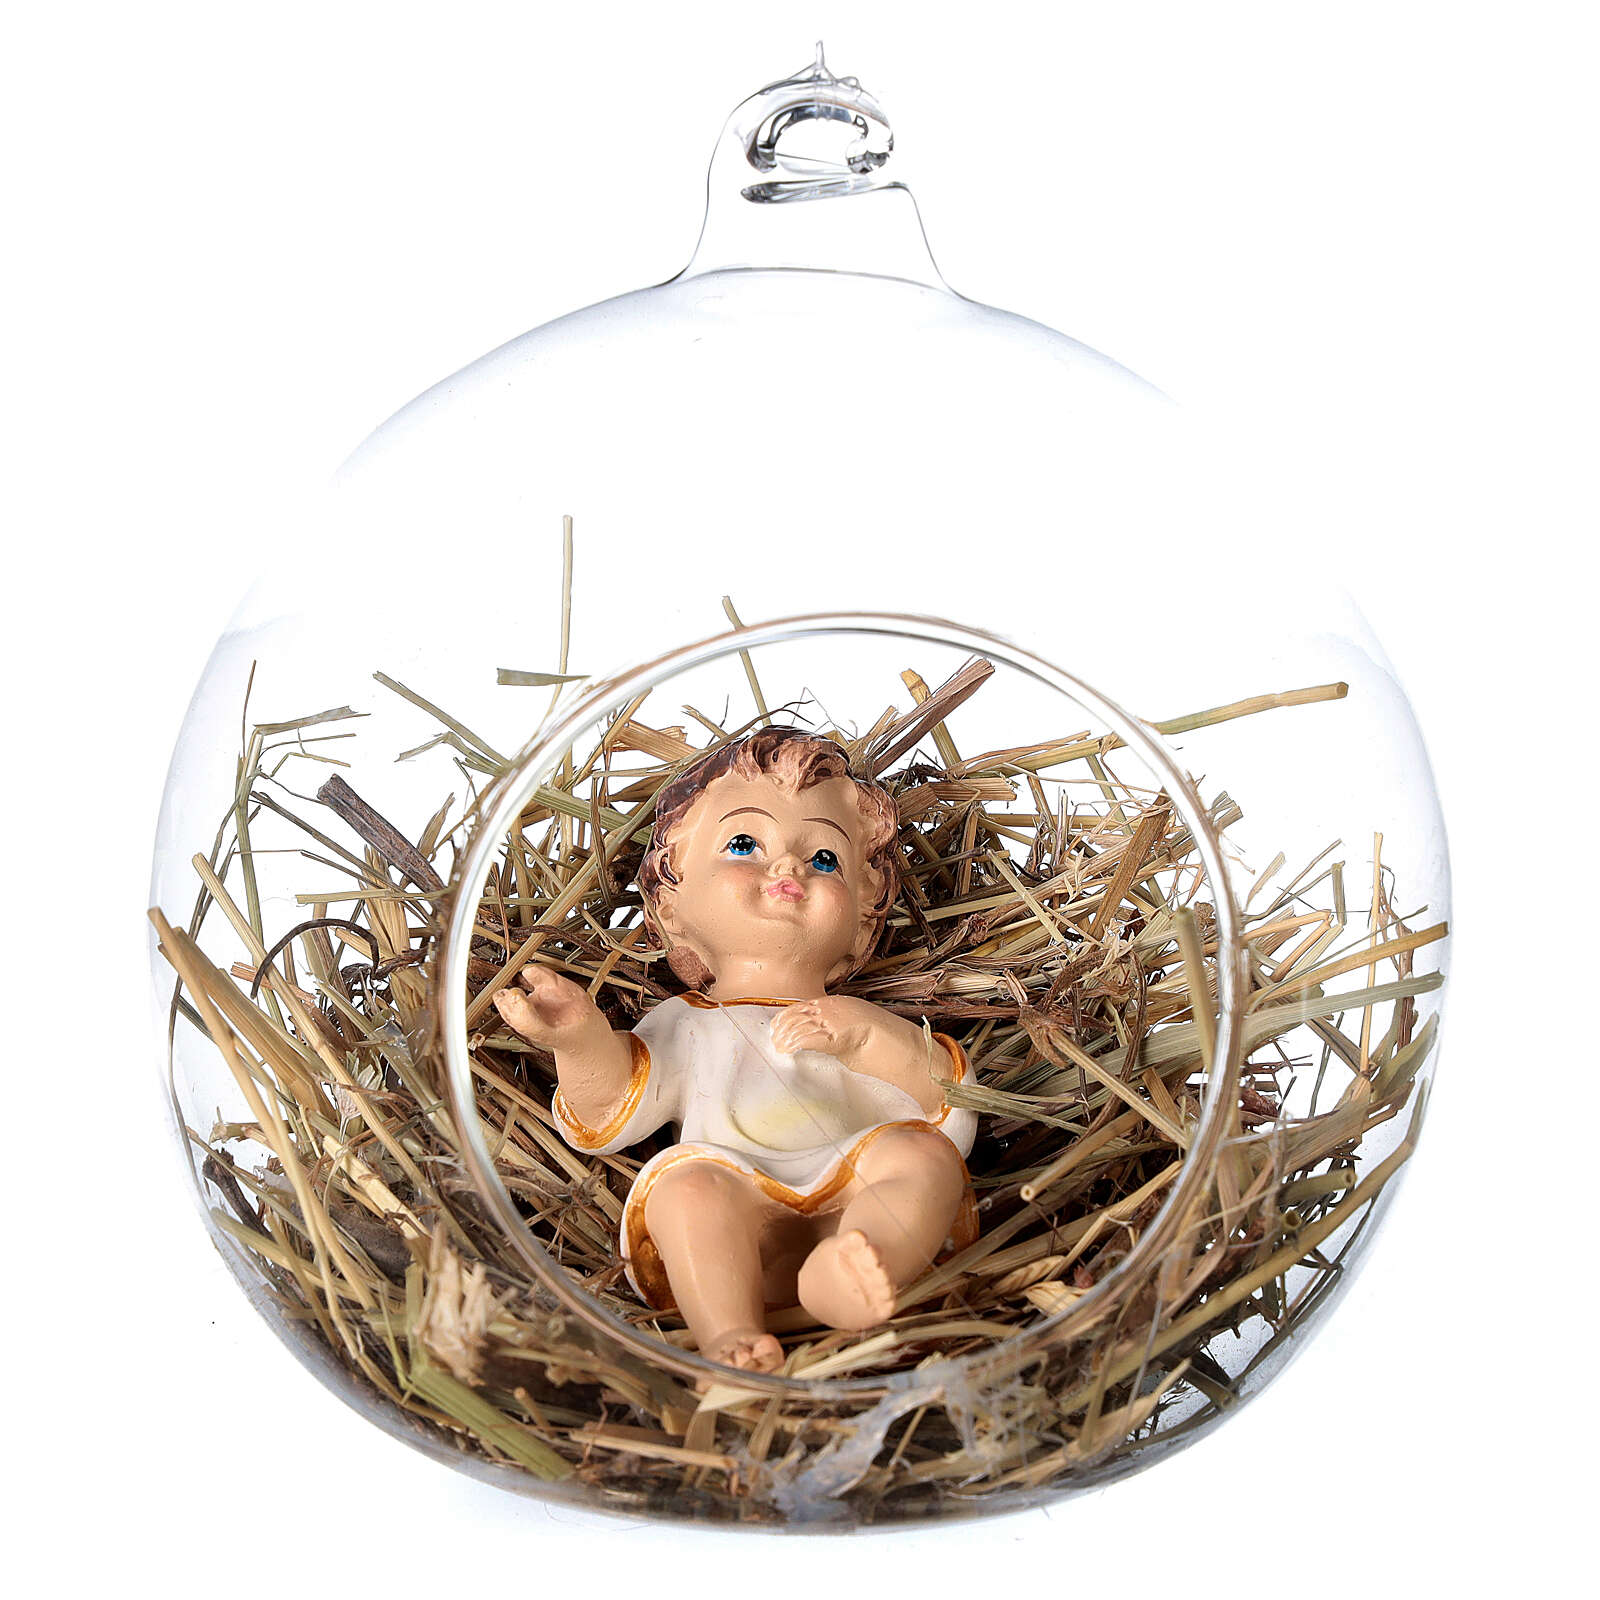 Baby Jesus statue 8 cm inside a glass ball 12 cm 4